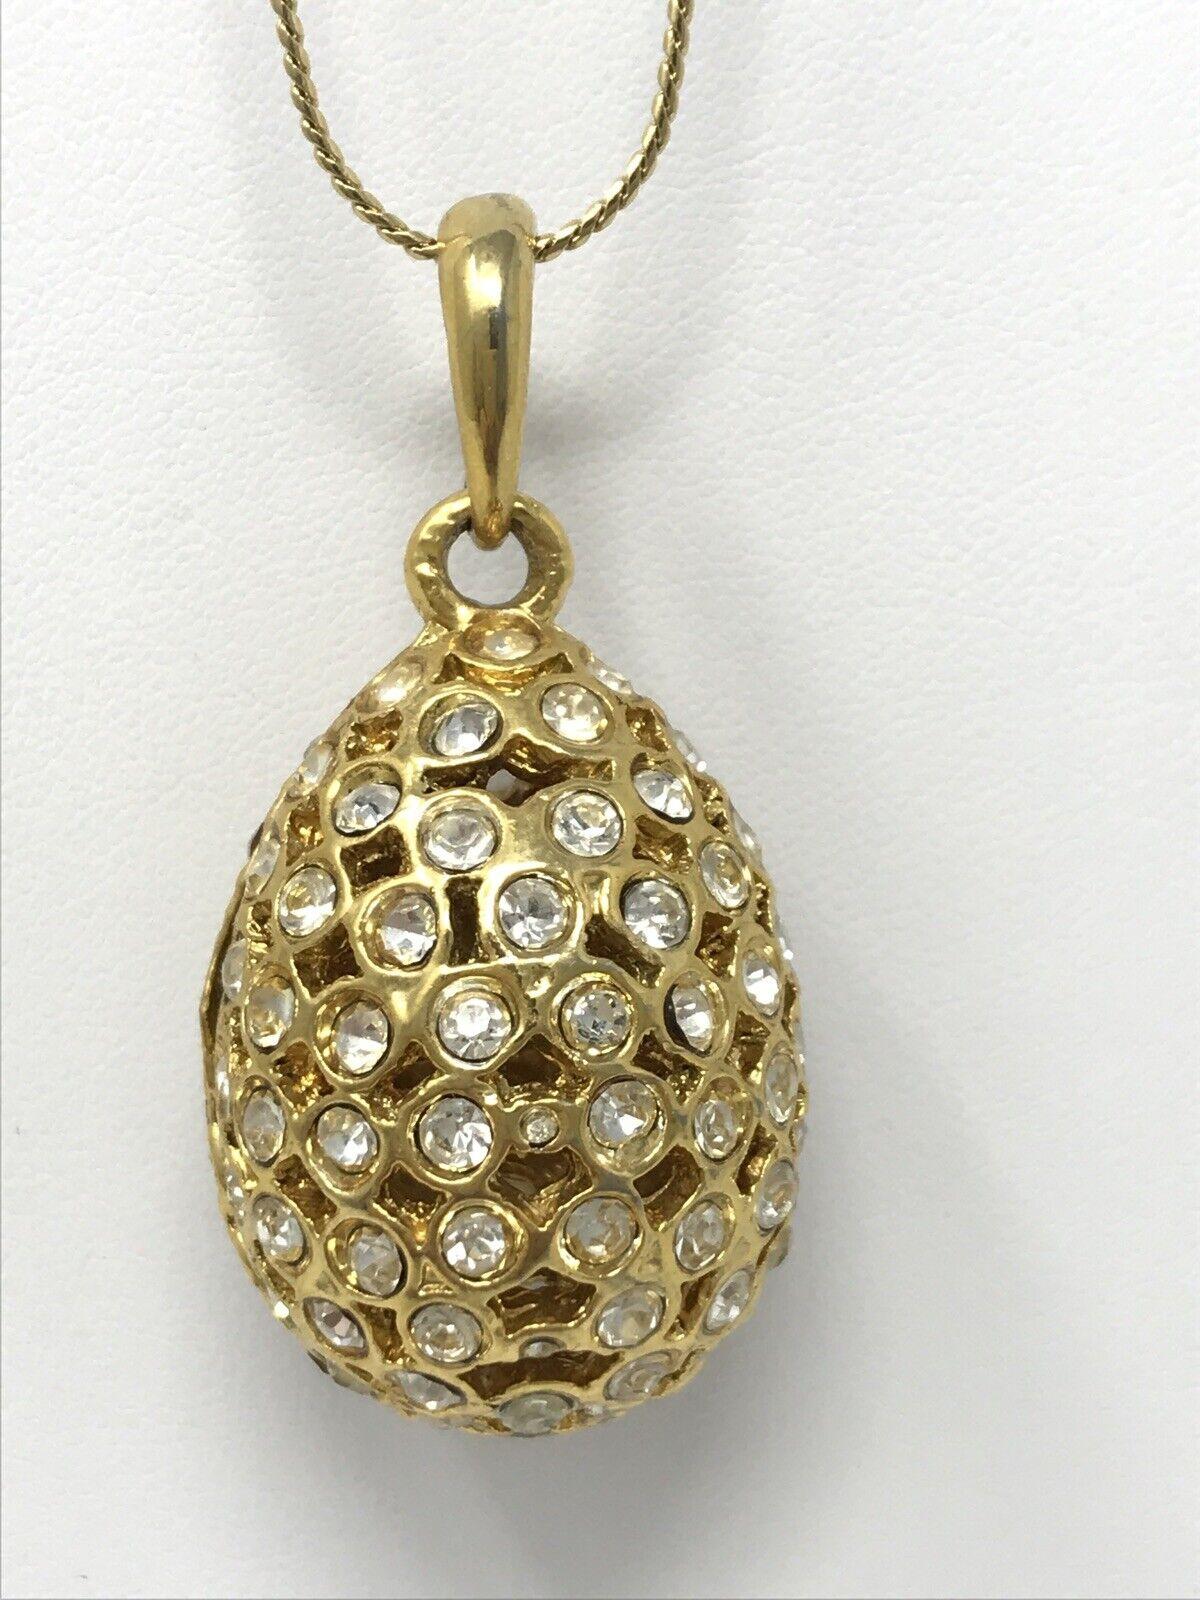 Gifts For Her Trifari Crystal Choker Vintage Rhinestone Crystals Vintage Trifari Crystal Necklace Wedding Bridal